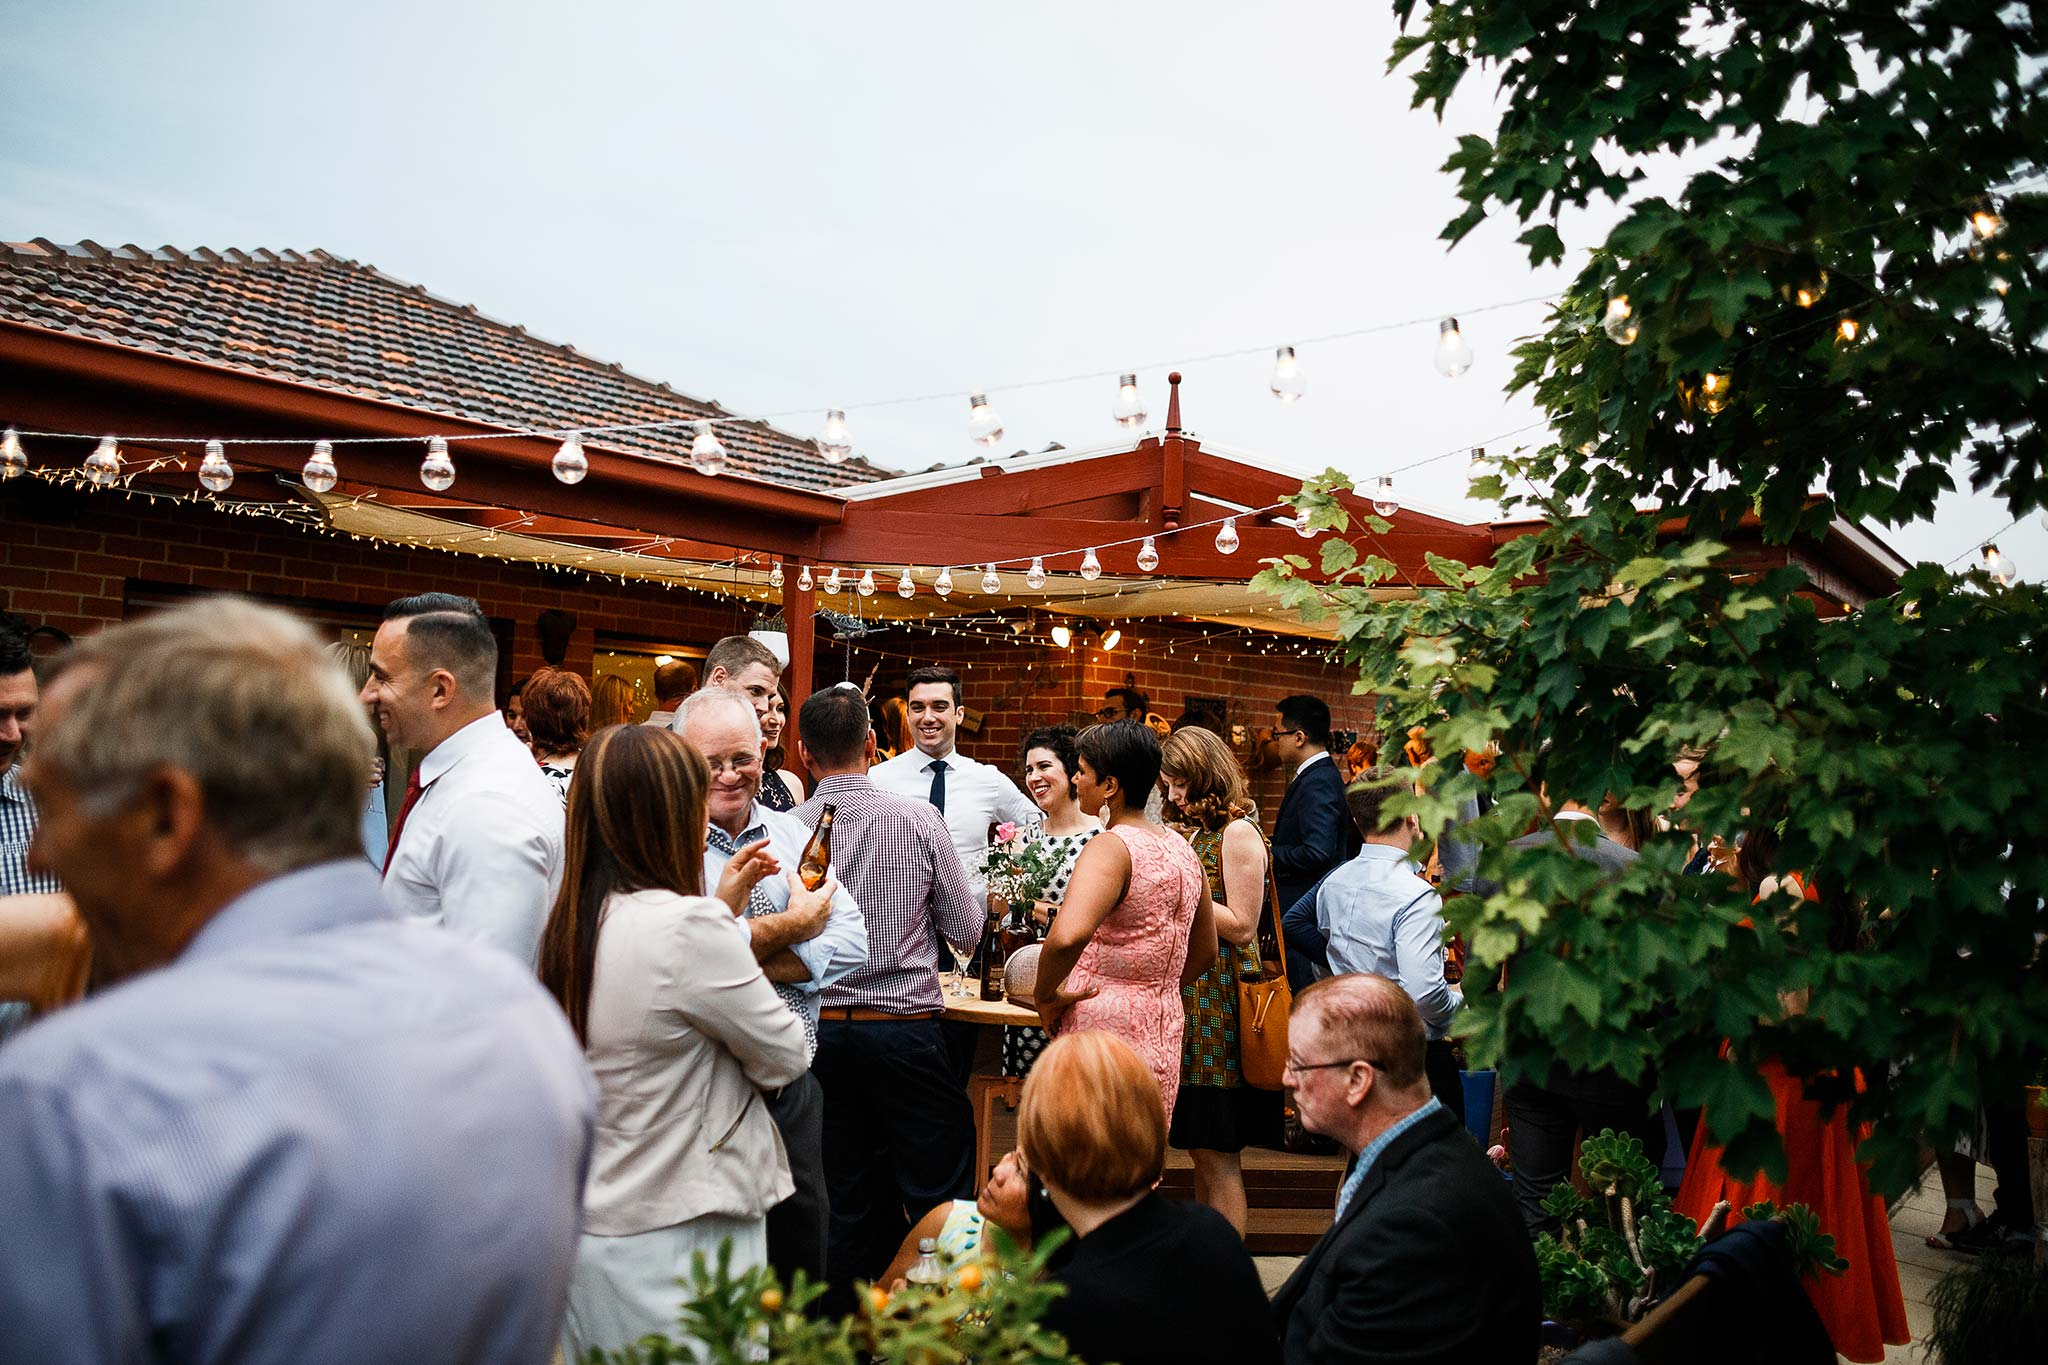 Strathmore-Melbourne-Backyard-Wedding-reception-guests